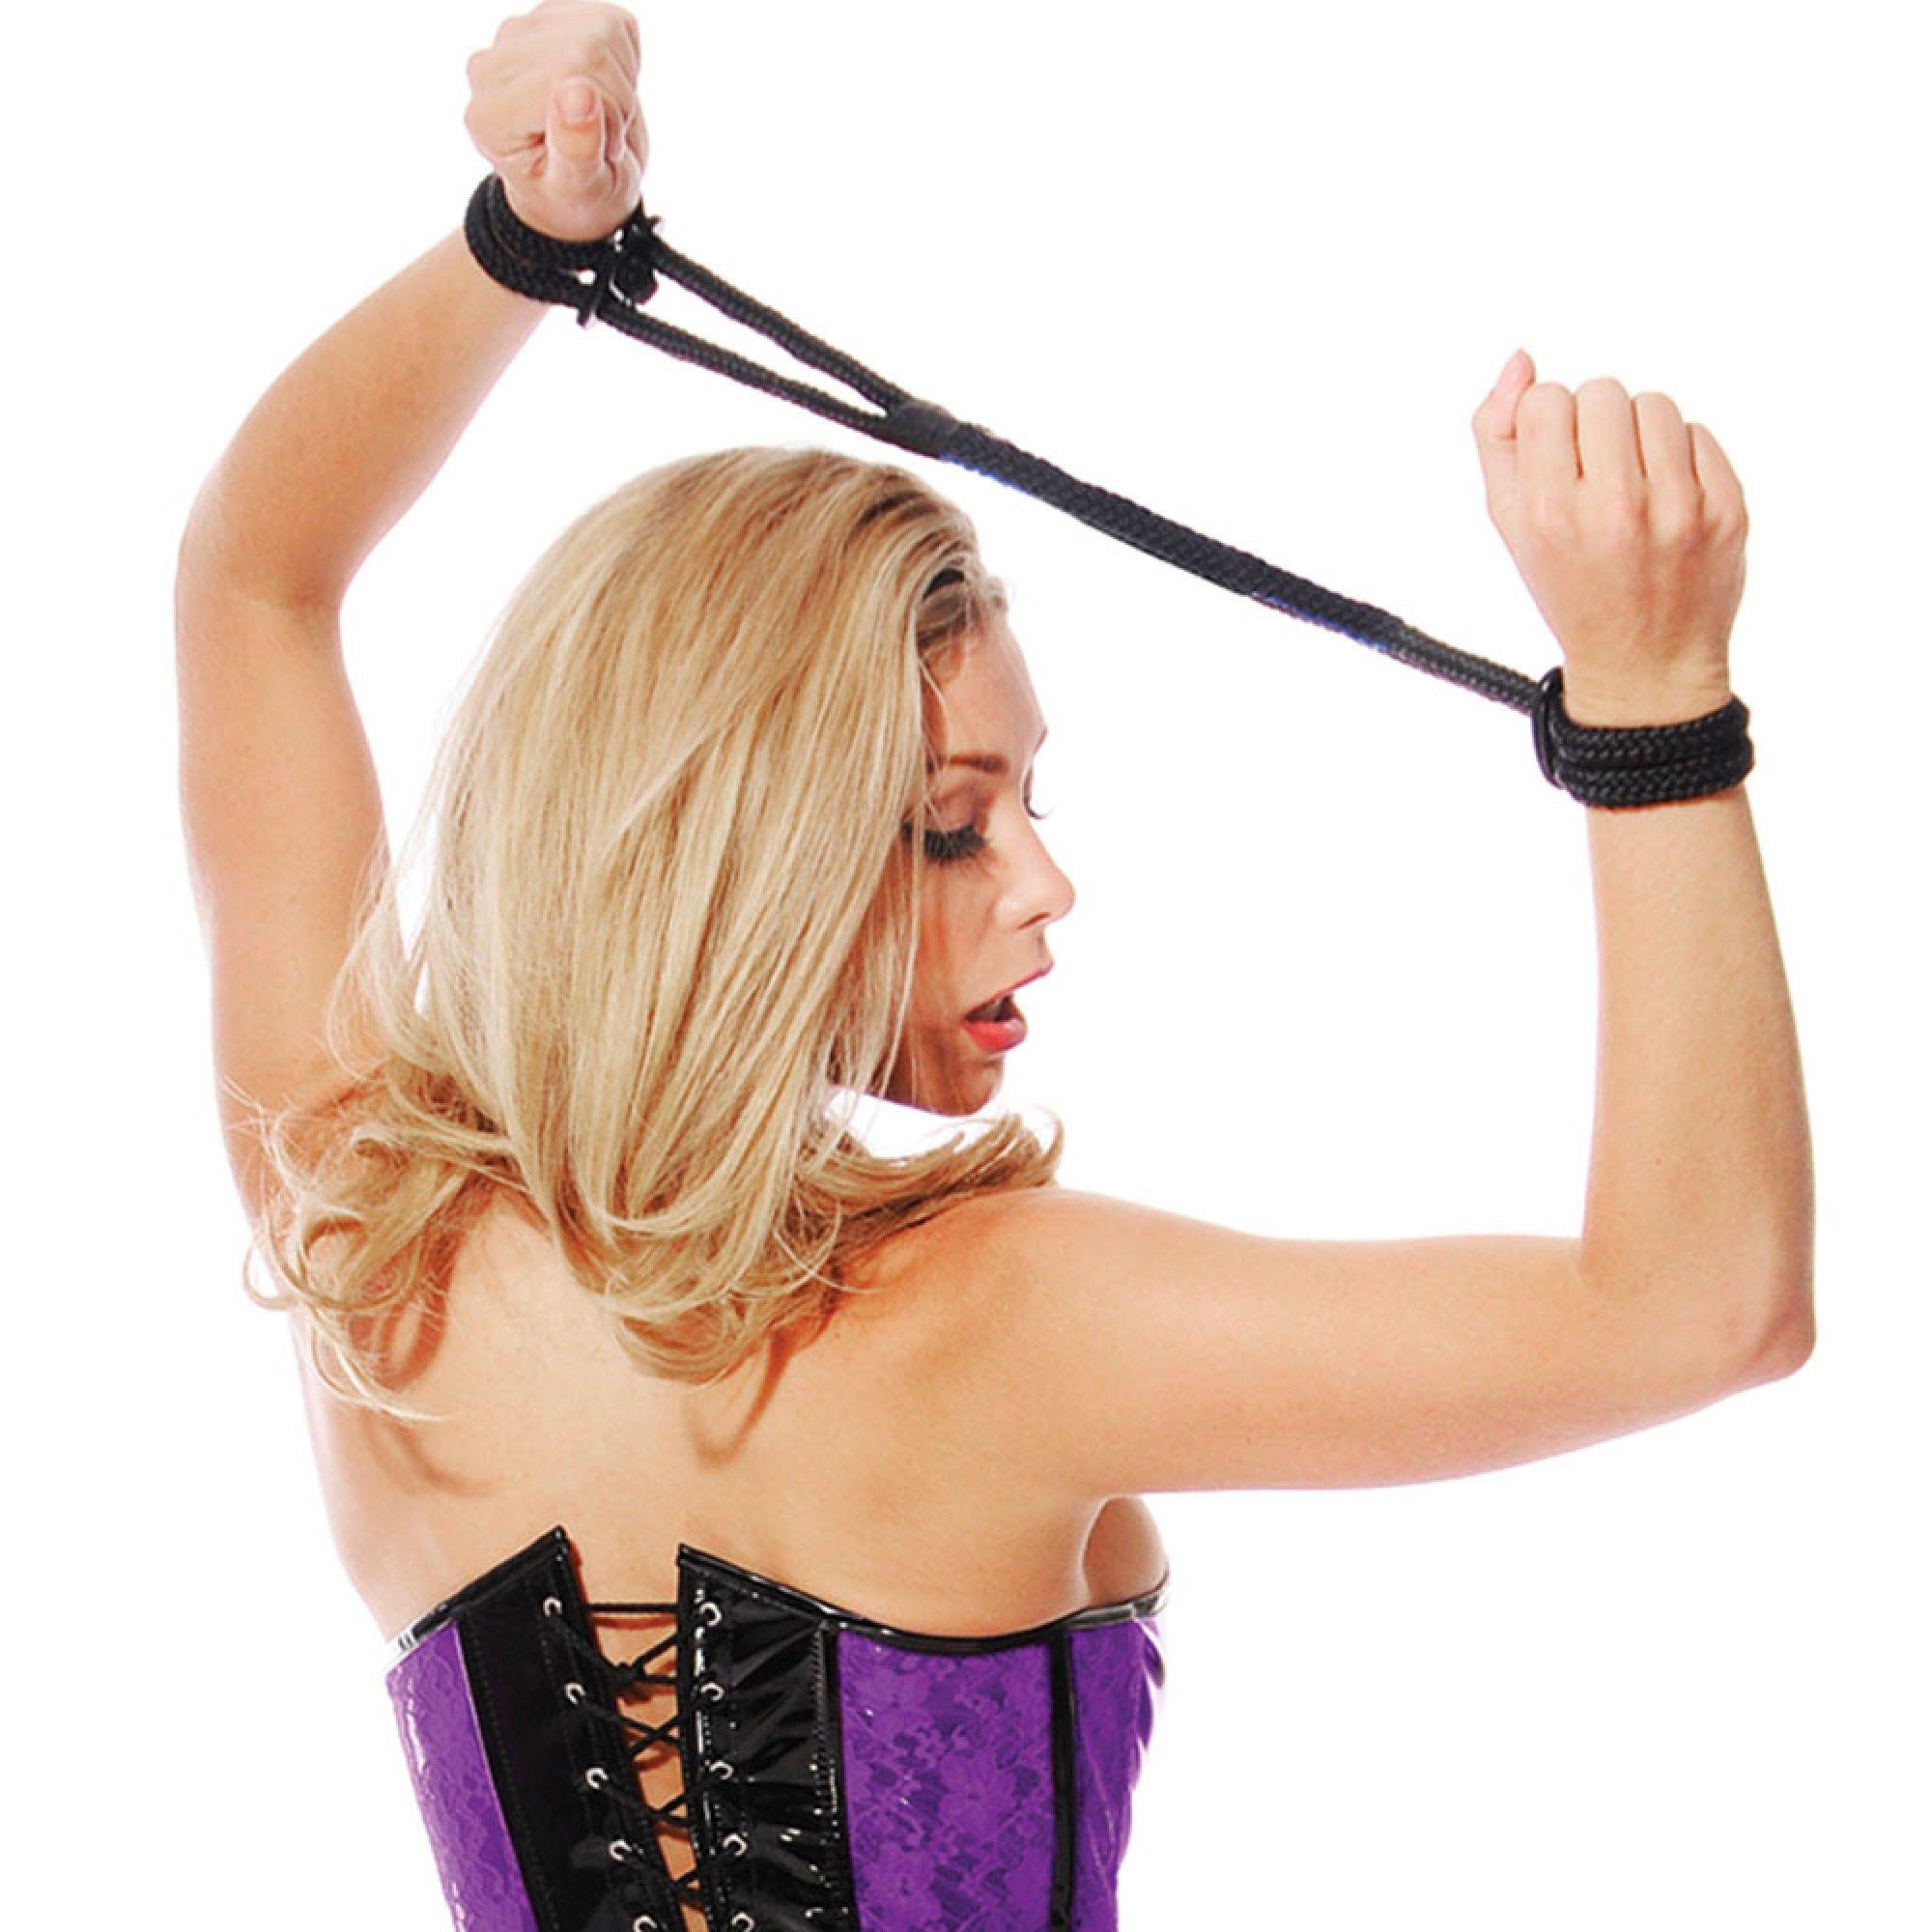 escorter i sverige bondage rep